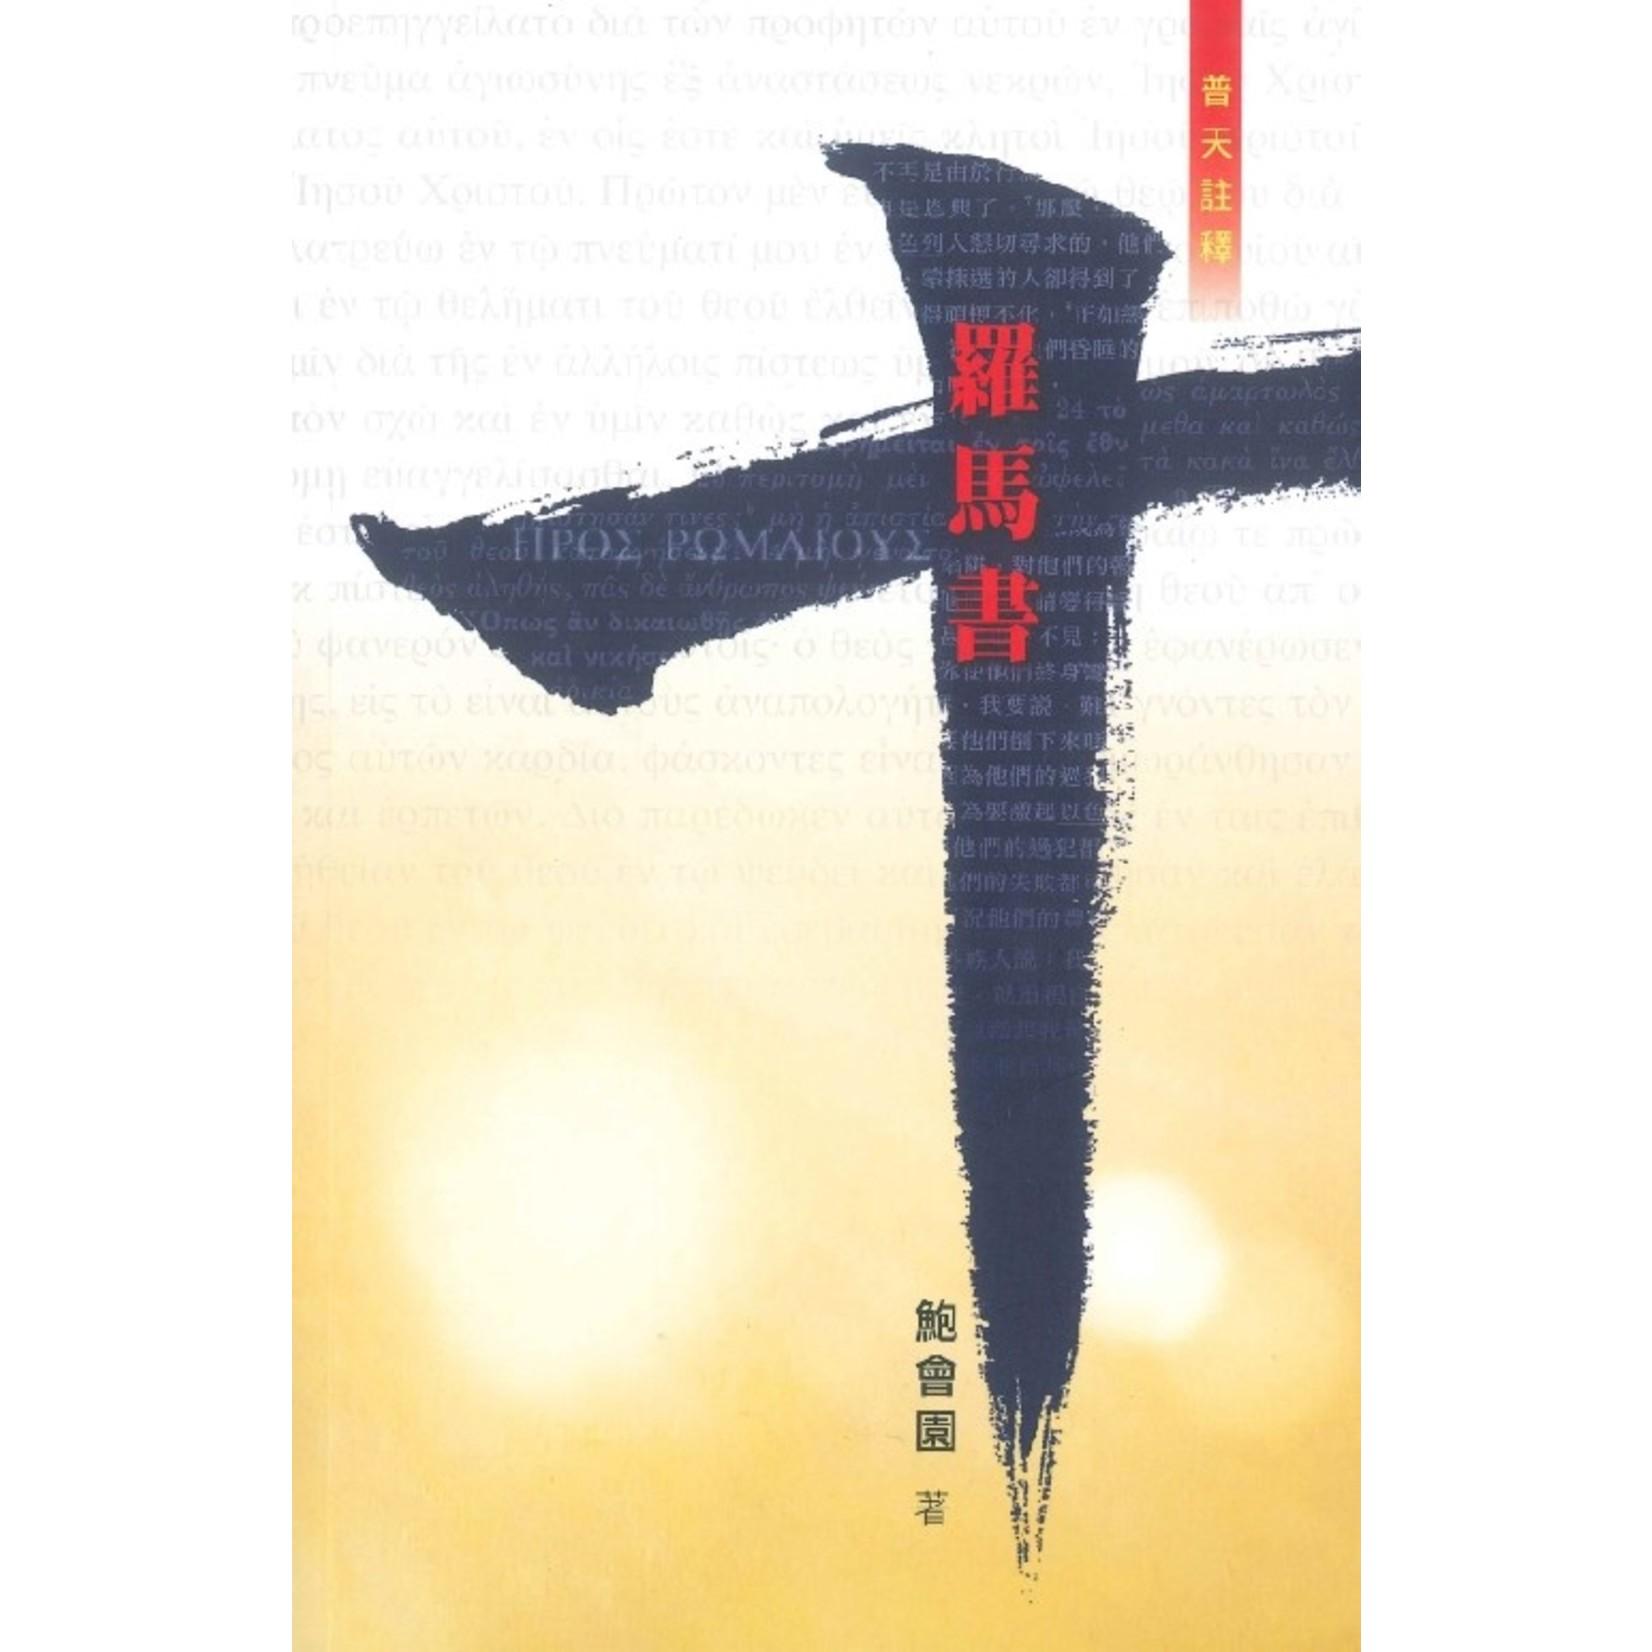 天道書樓 Tien Dao Publishing House 普天註釋:羅馬書